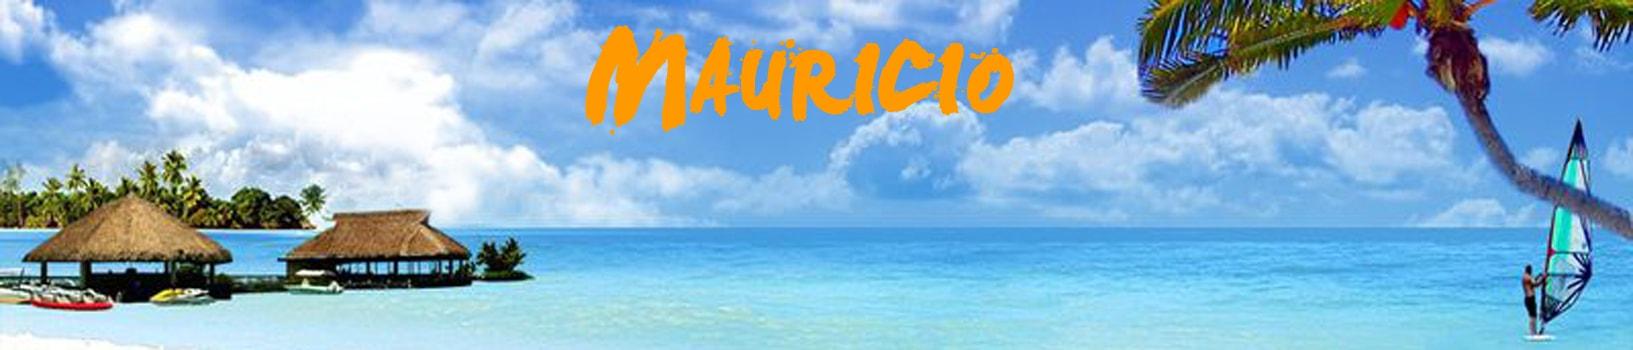 viaje-isla-mauricio-